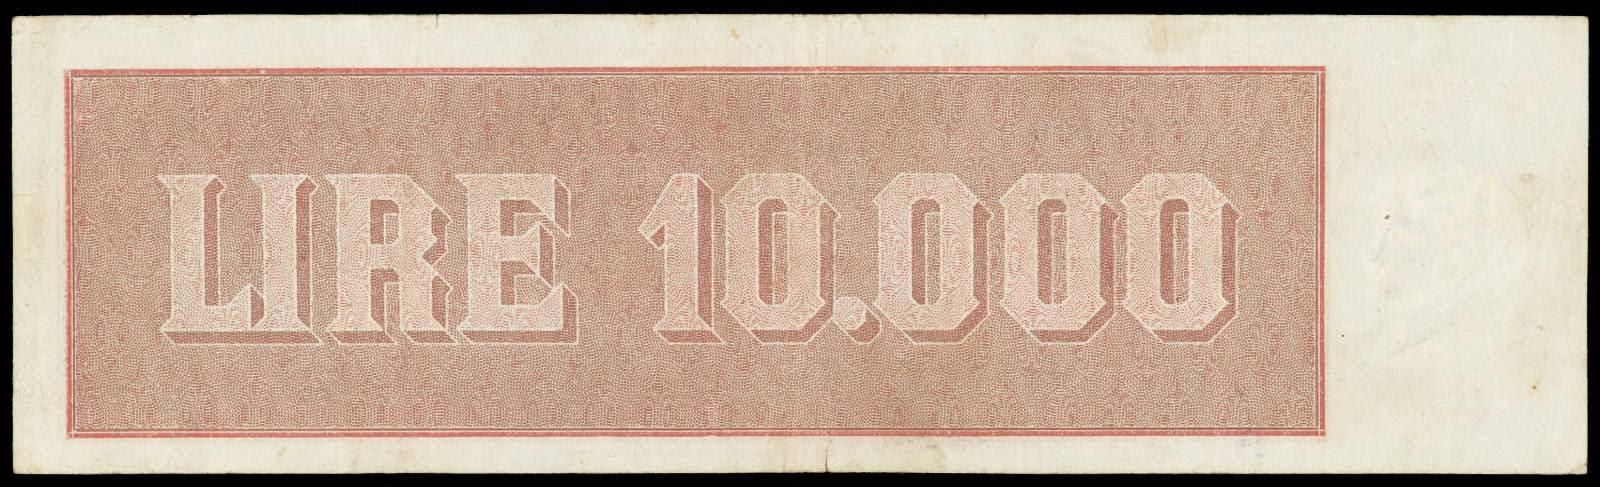 LIRE 10000